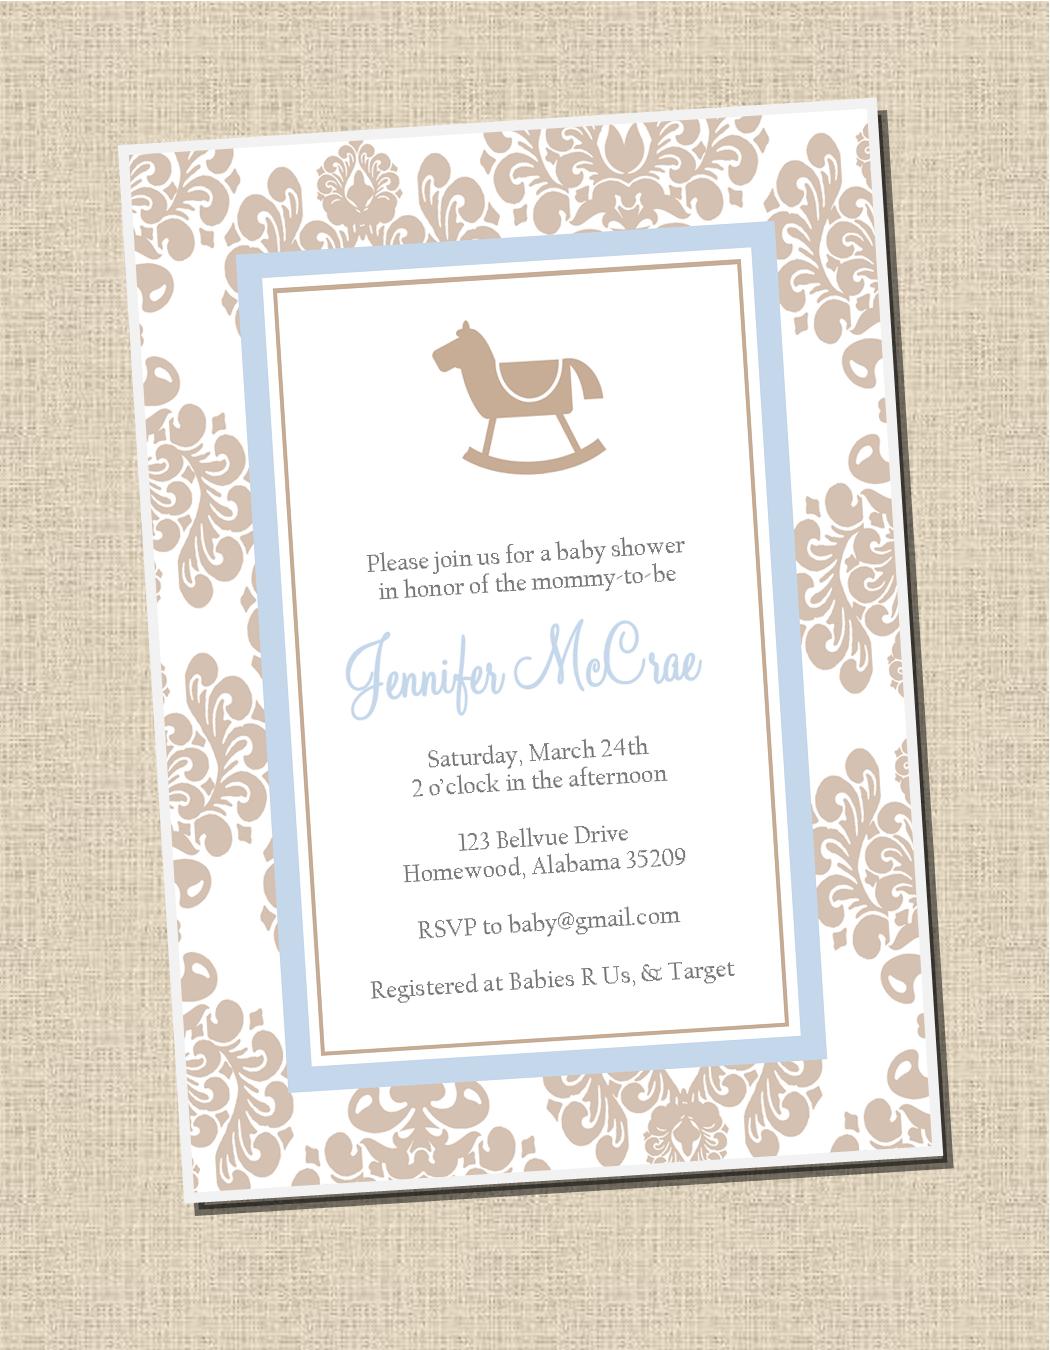 Damask rocking horse baby shower invitation sweet peach paperie damask rocking horse baby shower invitation filmwisefo Gallery